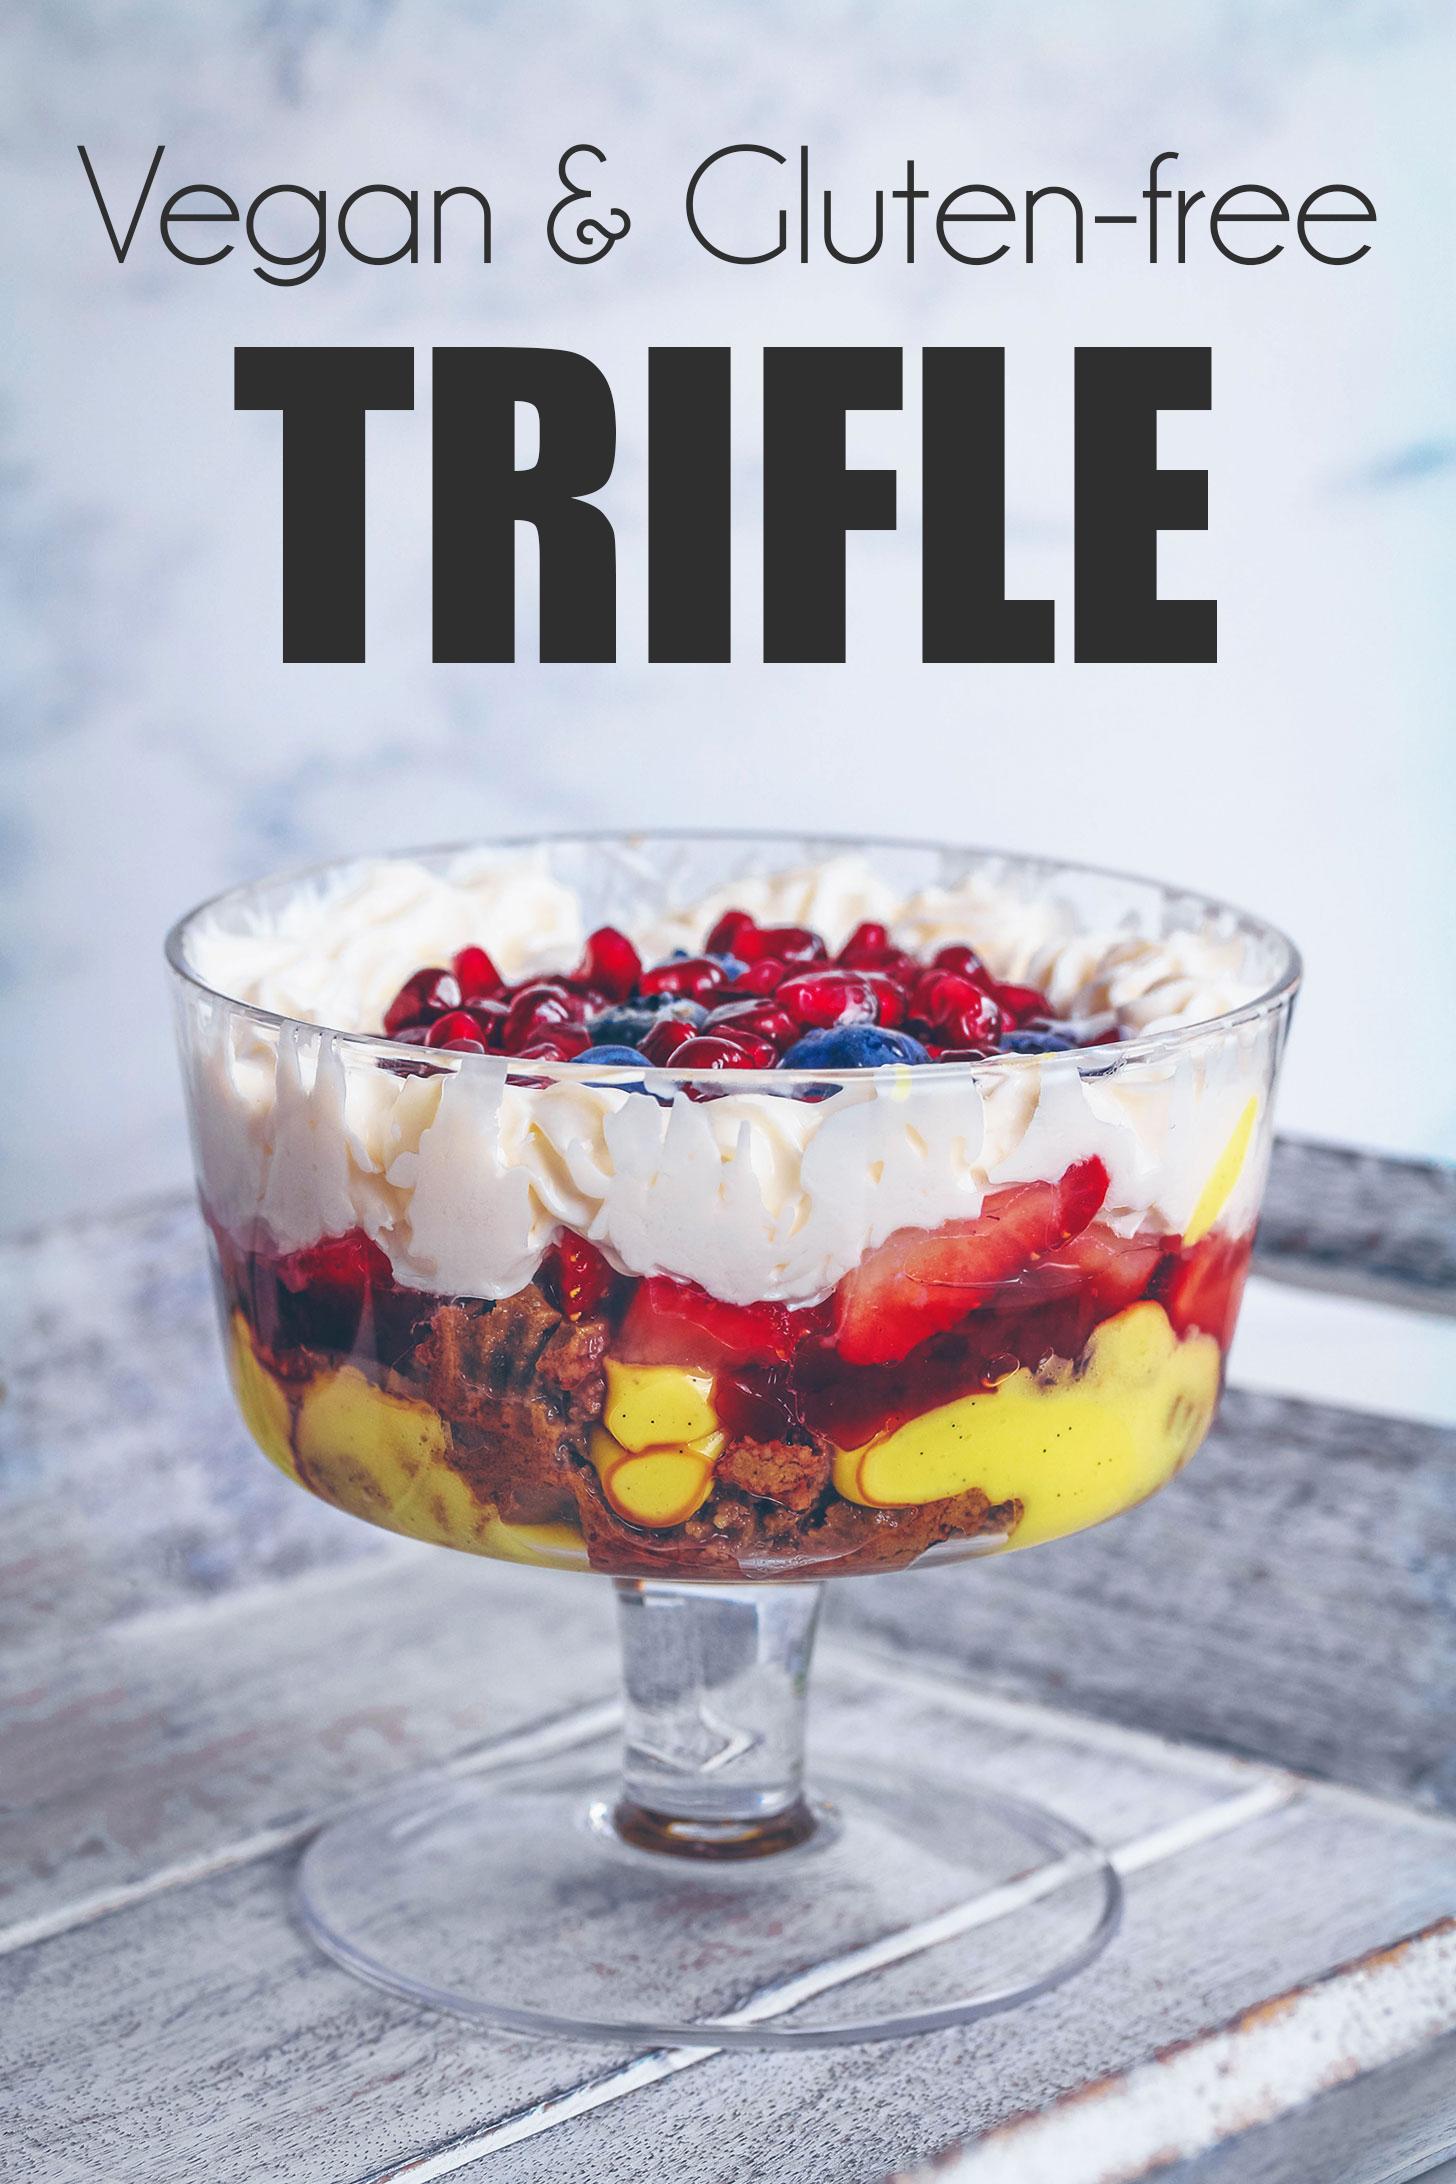 Vegan & Gluten-free Trifle